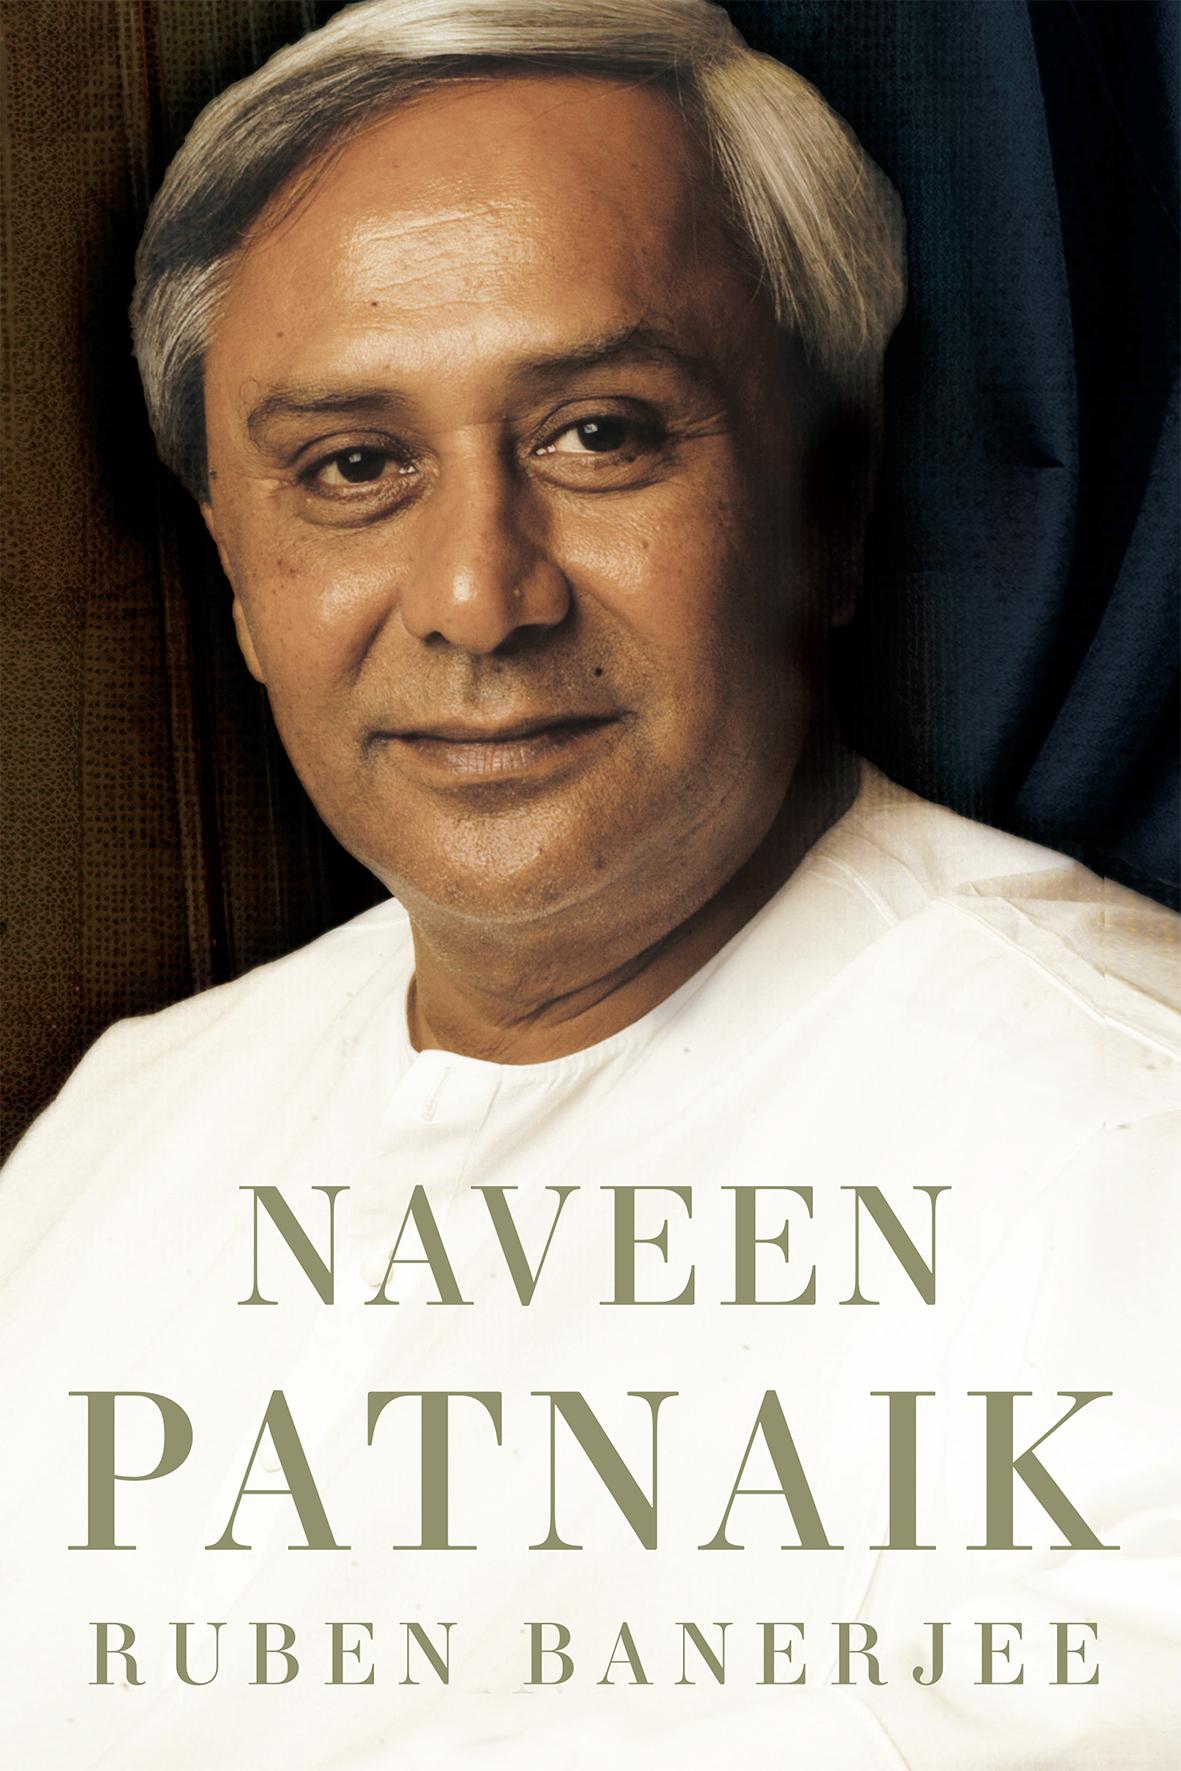 Book Cover: Naveen Patnaik by Ruben Banerjee